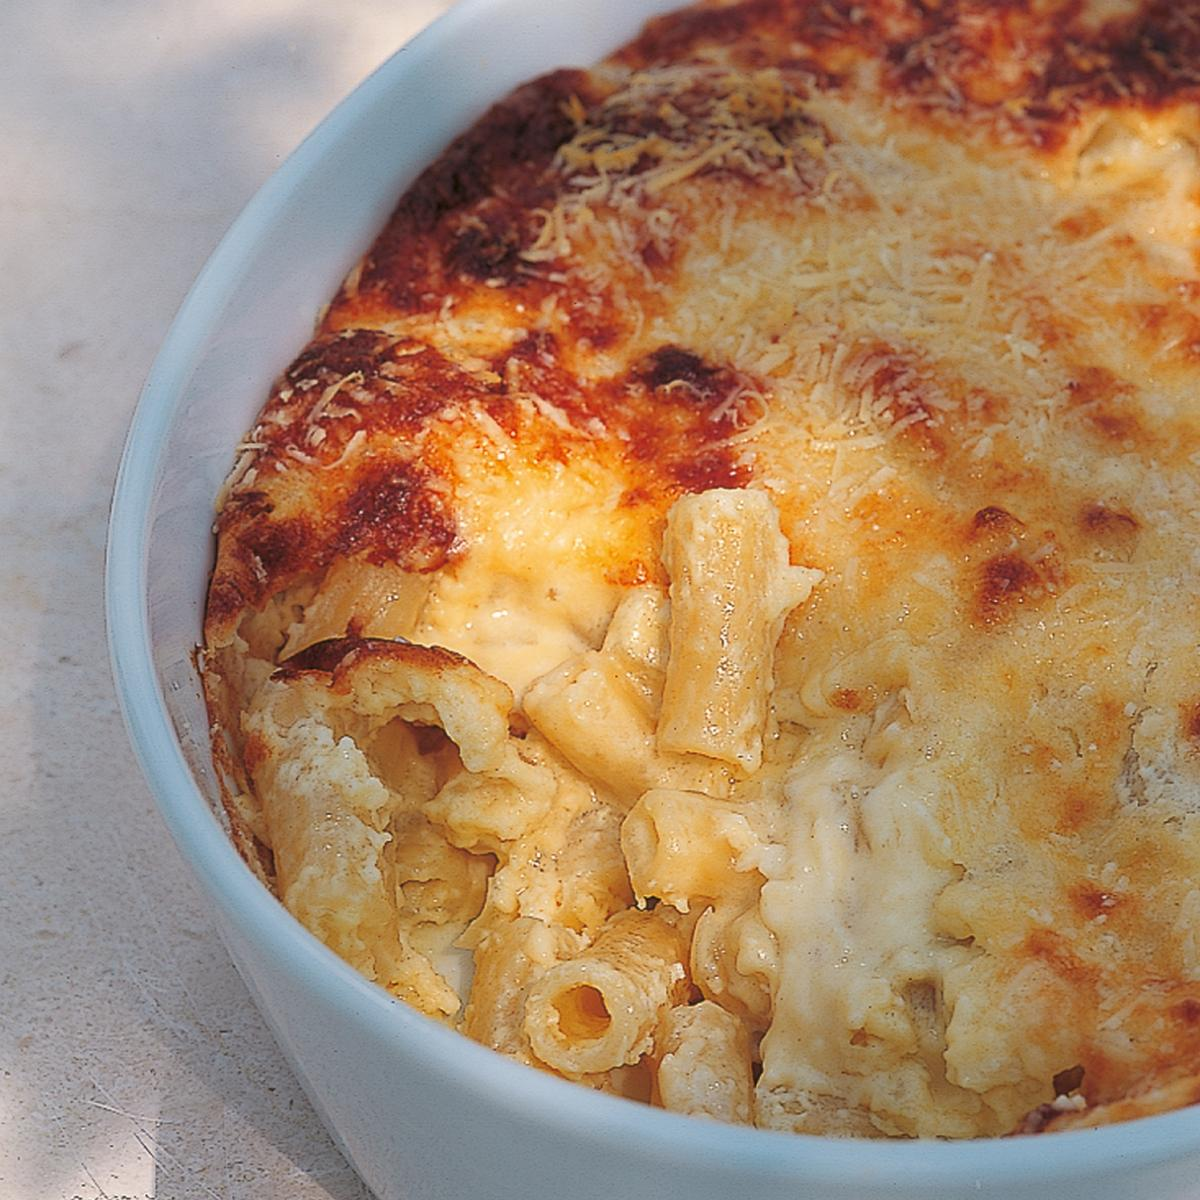 Htc souffled macaroni cheese